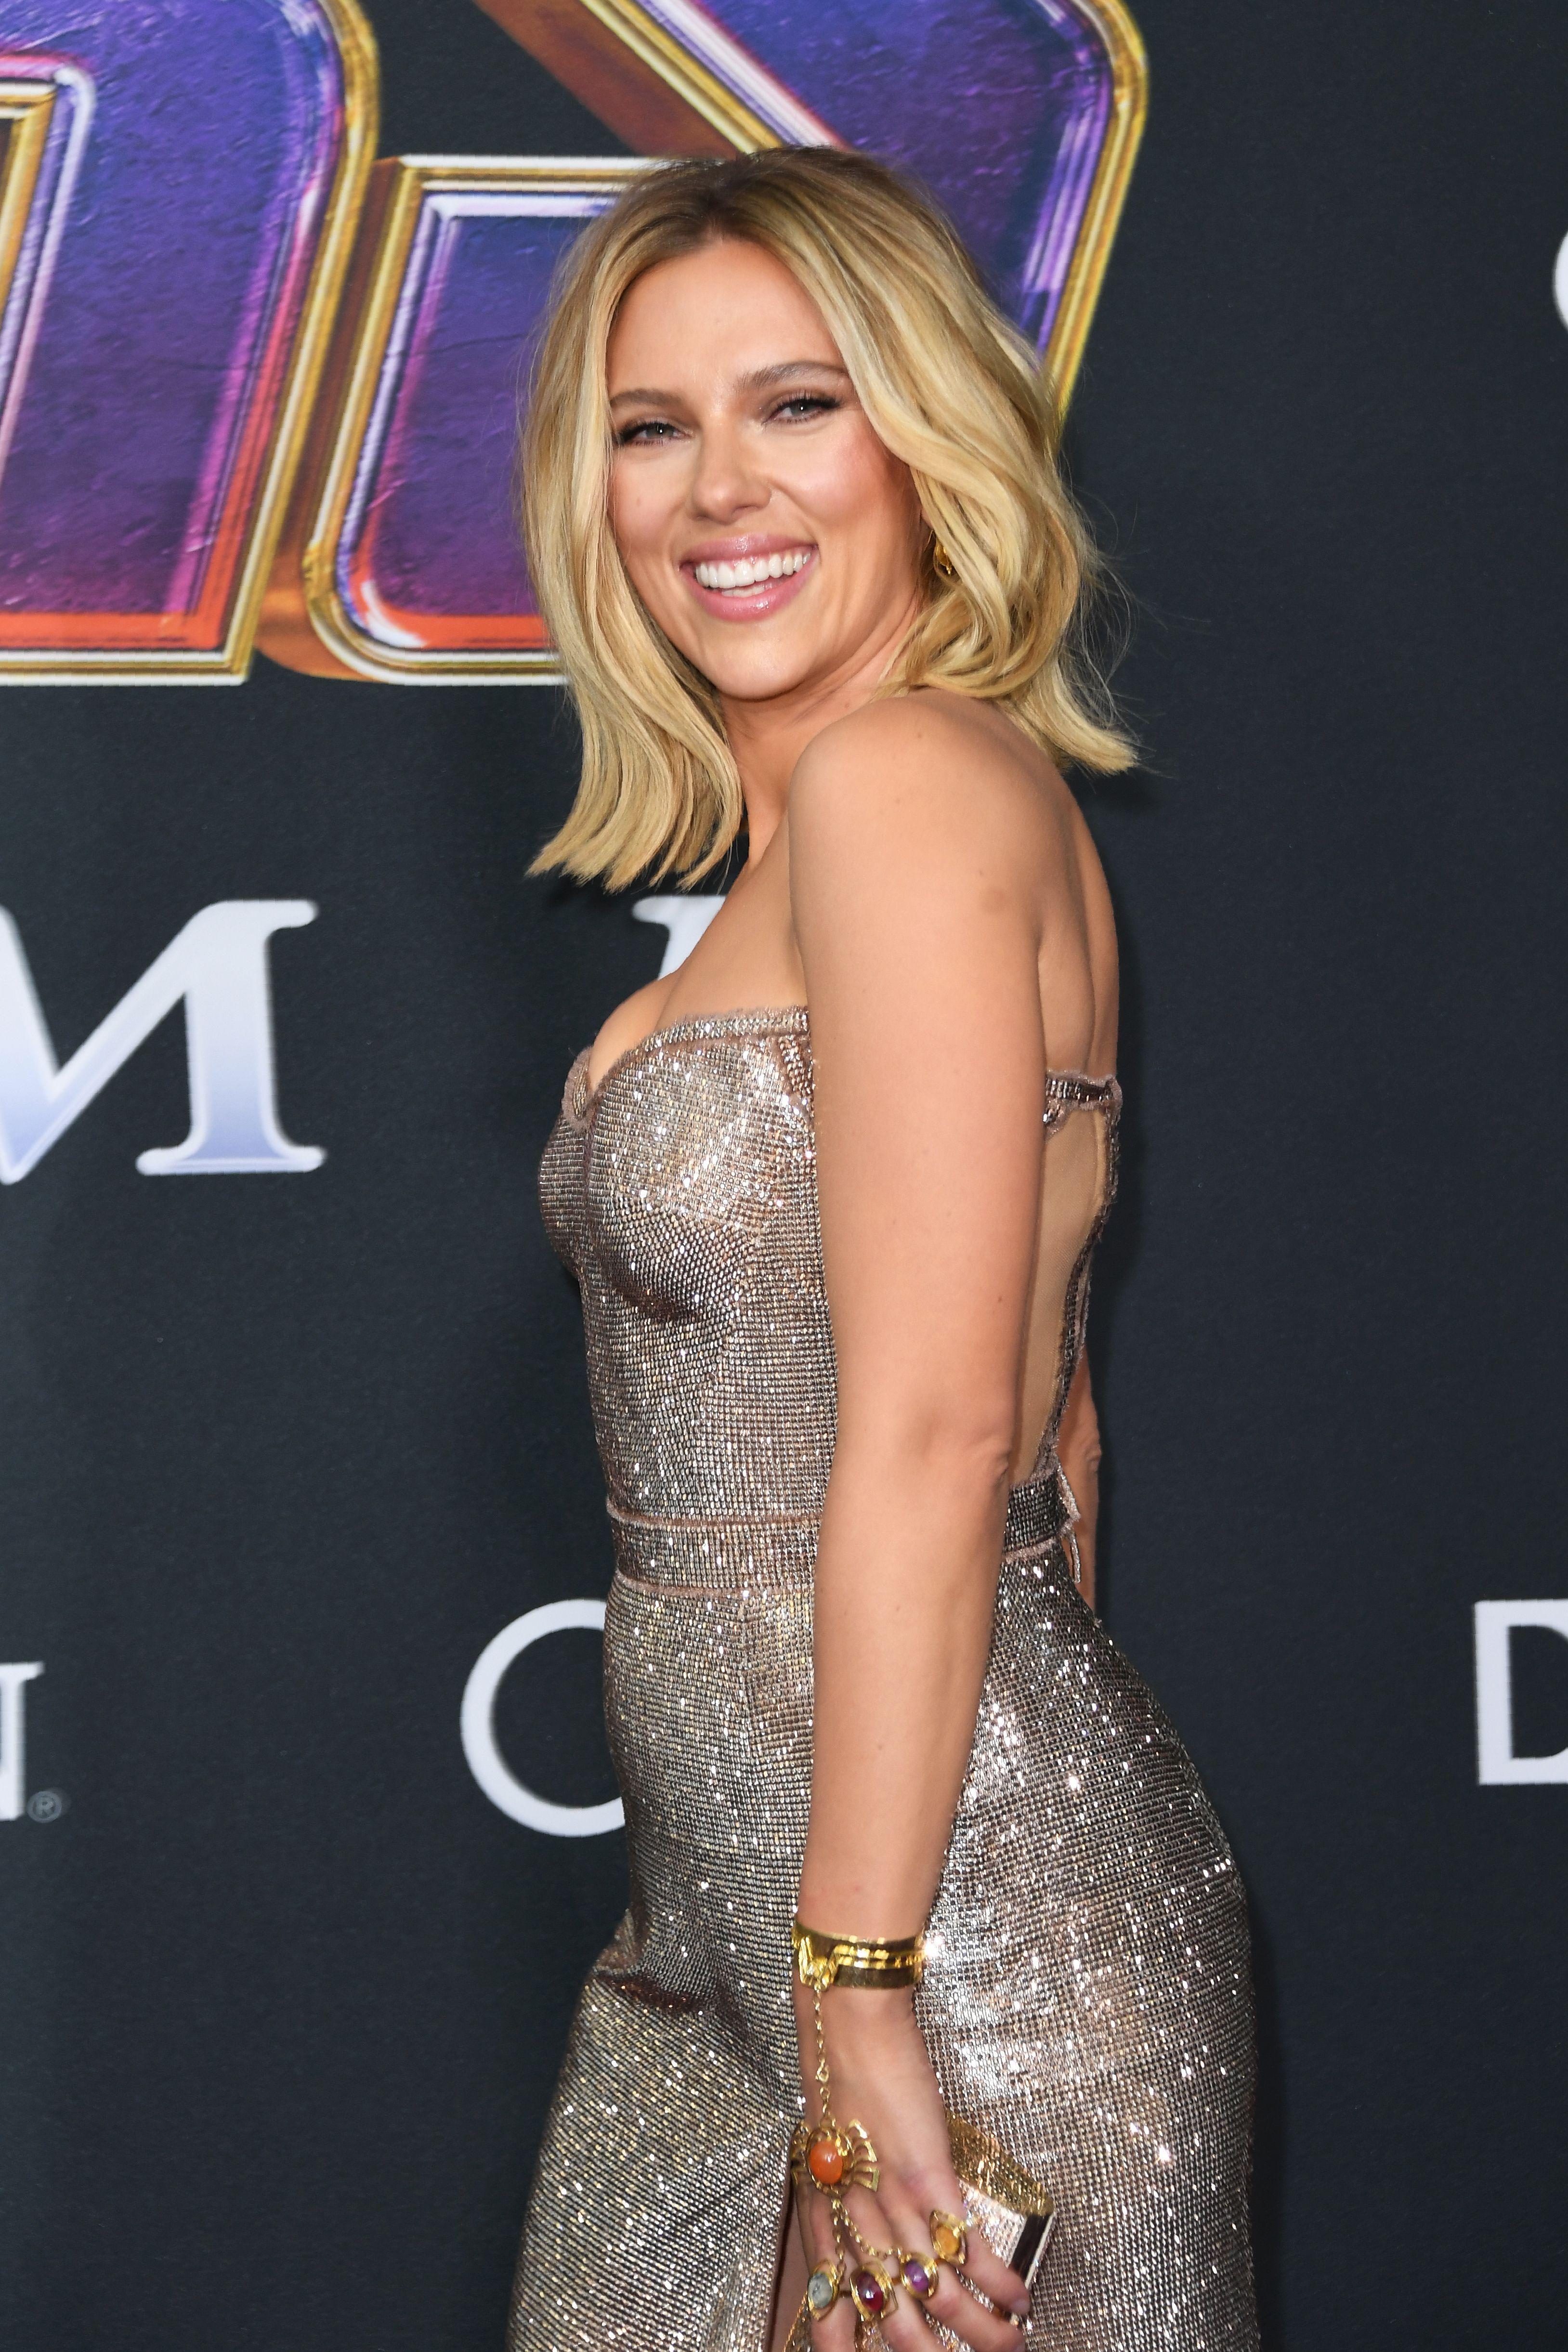 Scarlett Johansson At The Avengers Endgame Premiere Photo Credits Getty Images Scarlett Johansson Scarlett Scarlet Johansson